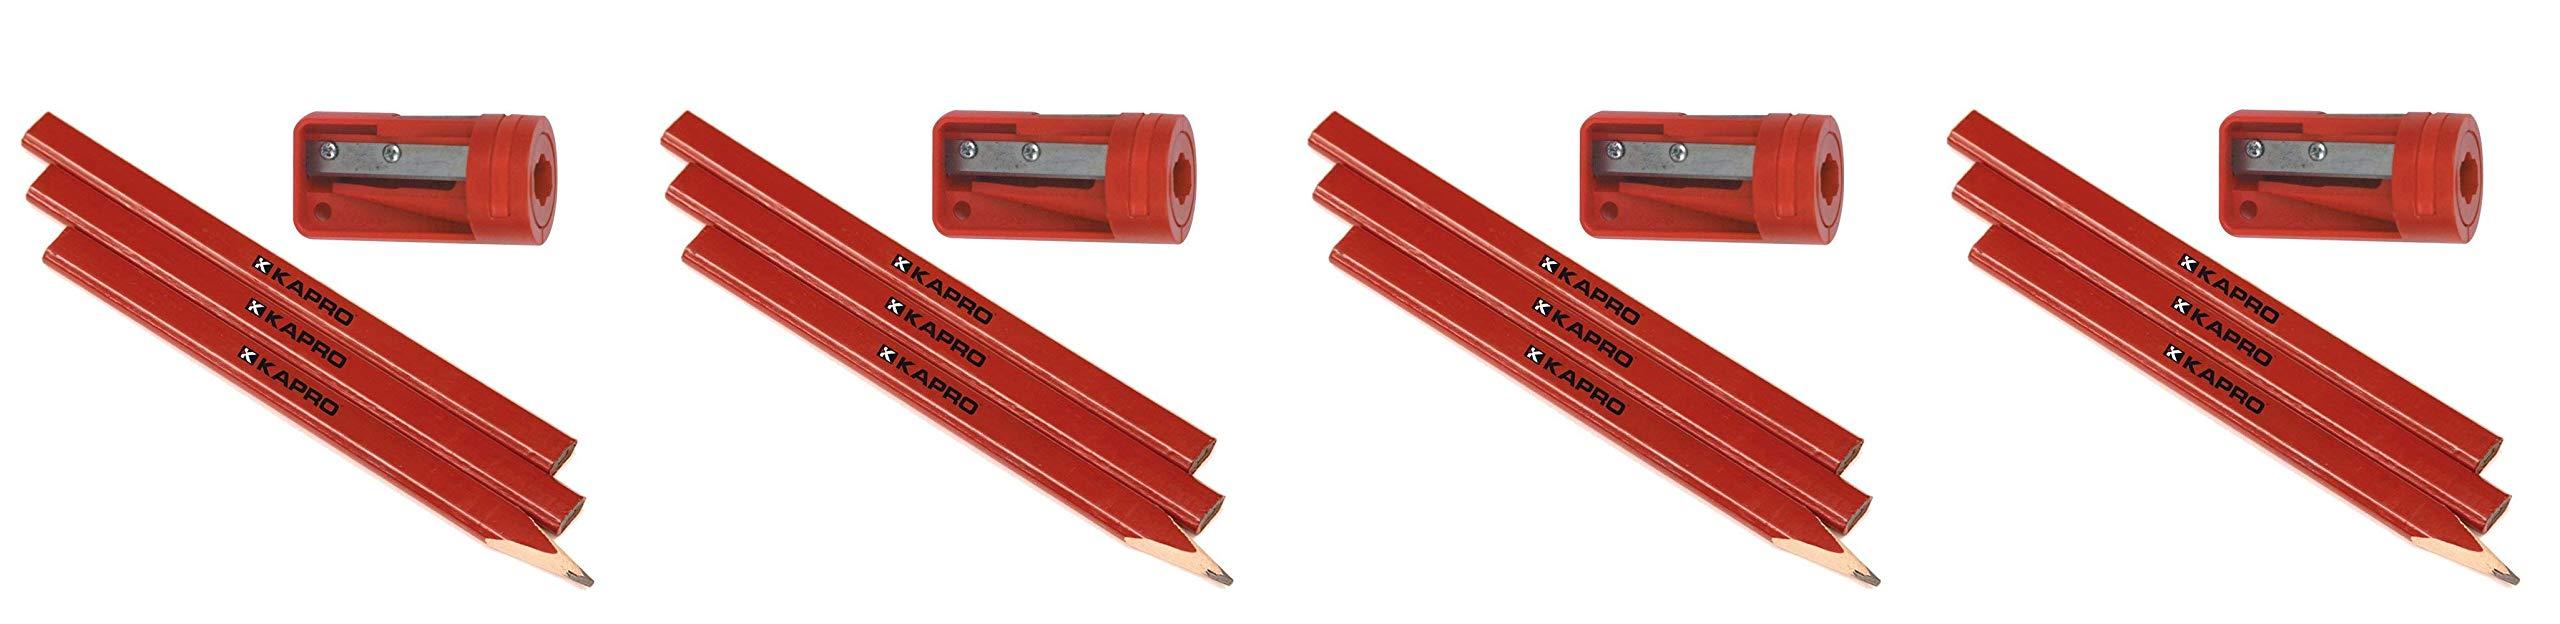 Kapro 275S Sharpener and 3 Pencil Set (Fоur Paсk) by Kapro (Image #1)